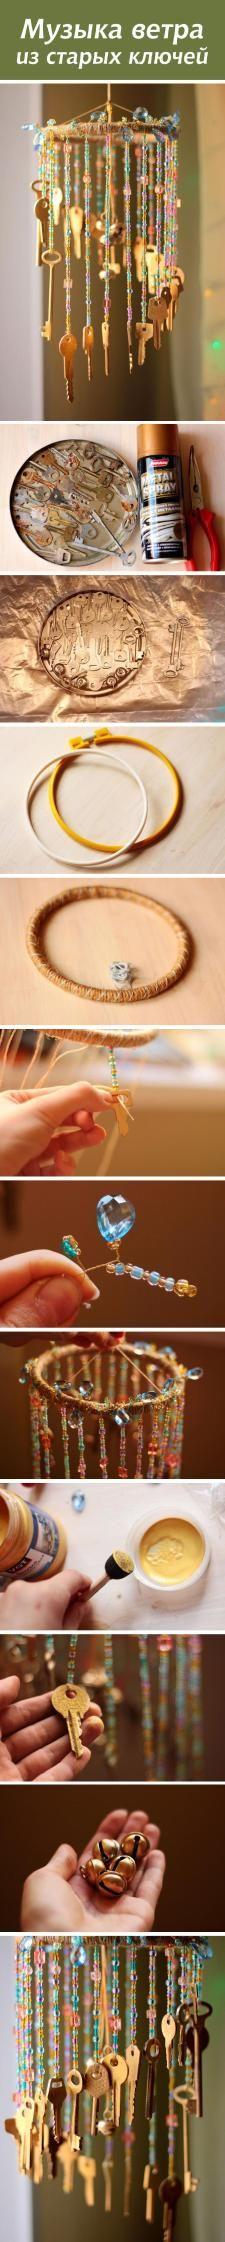 Jewelry Craft Ideas - Pandahall.com key and beads wind chimes mobile